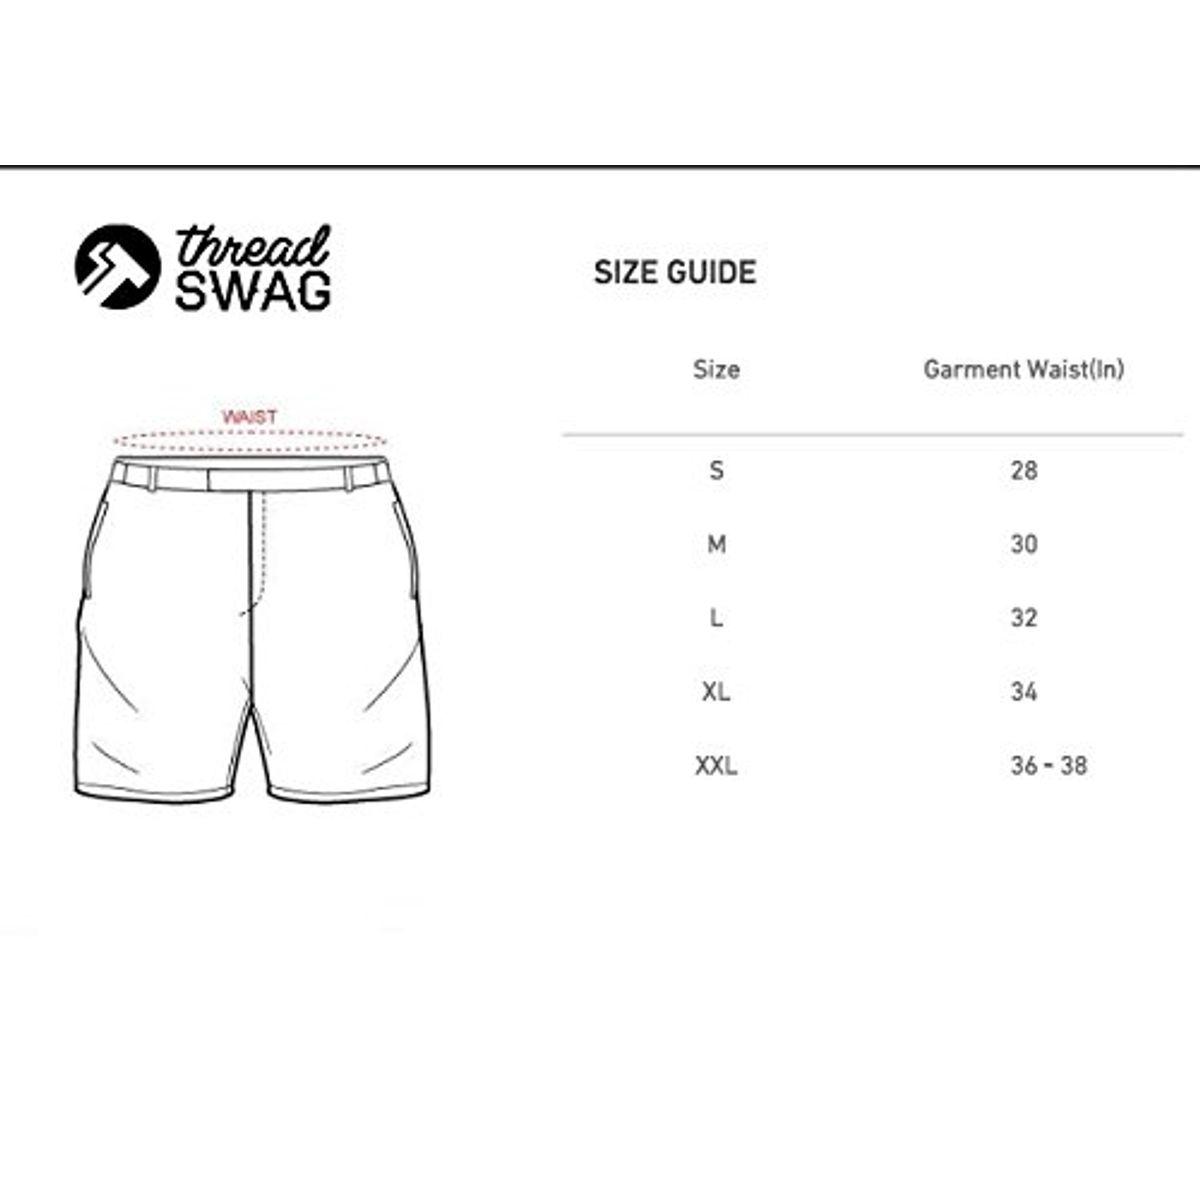 Thread Swag Mens Cotton Shorts With Zipper Pockets Navy